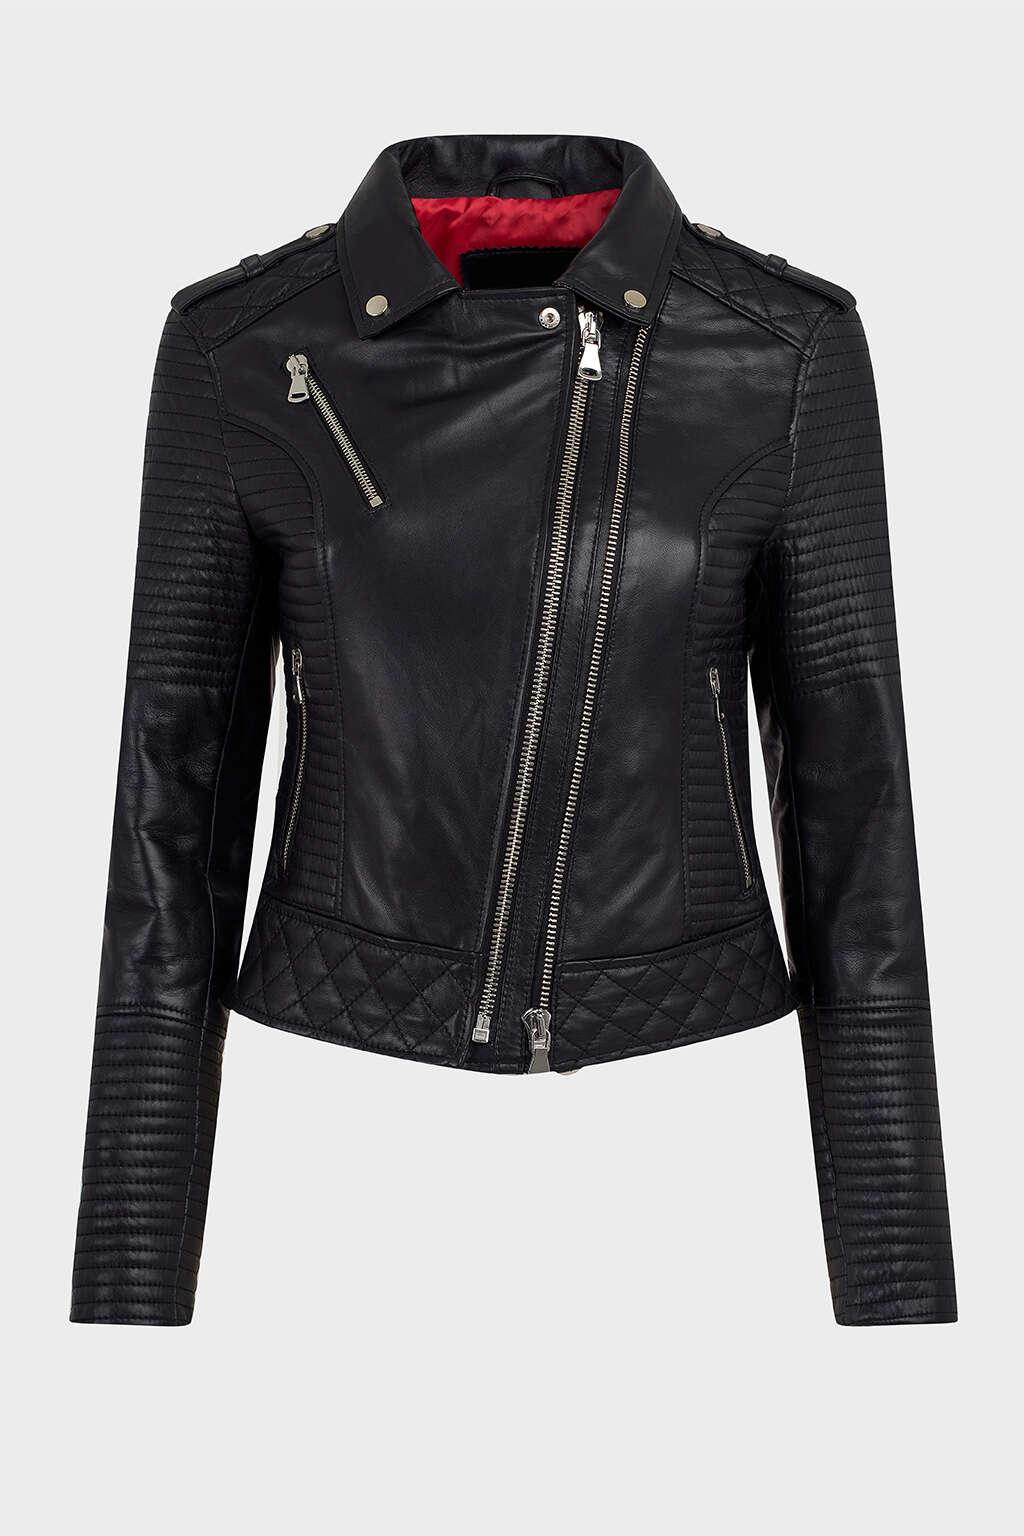 Front of Jet Black Ribbed Moto Leather Jacket